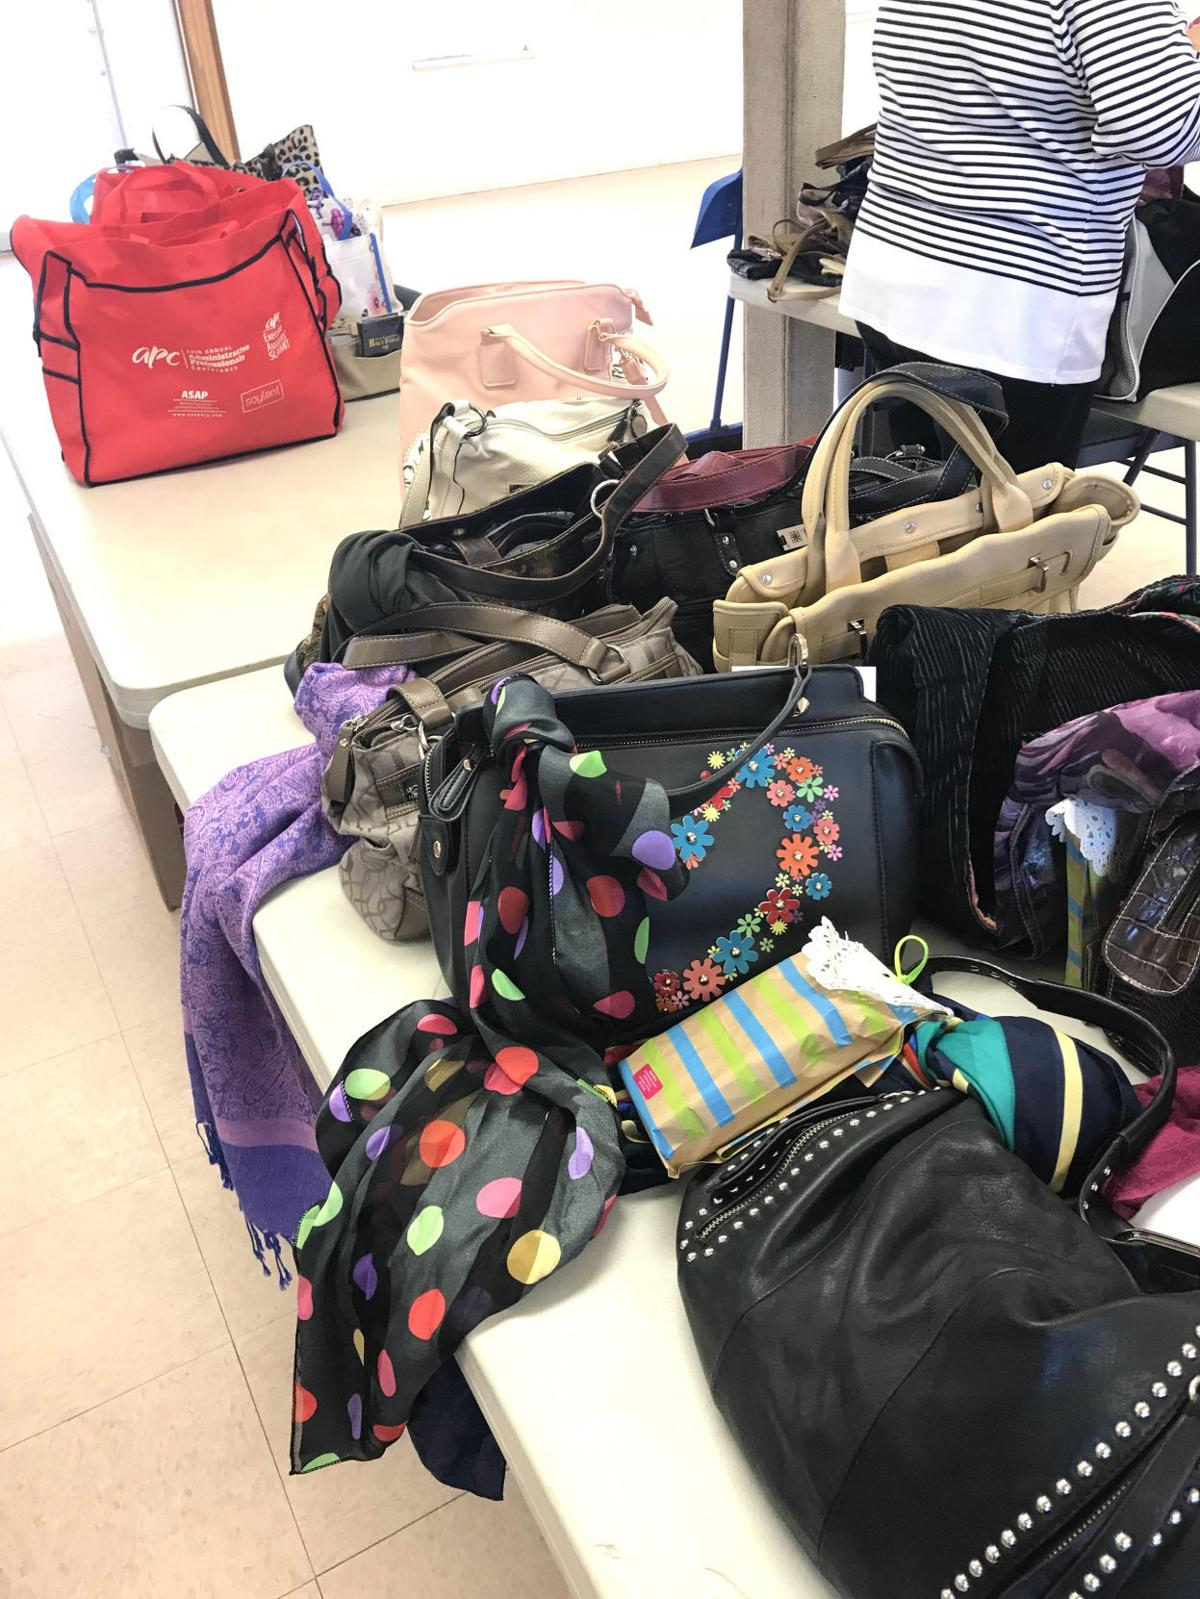 American Legion Post helps donate purses to veterans